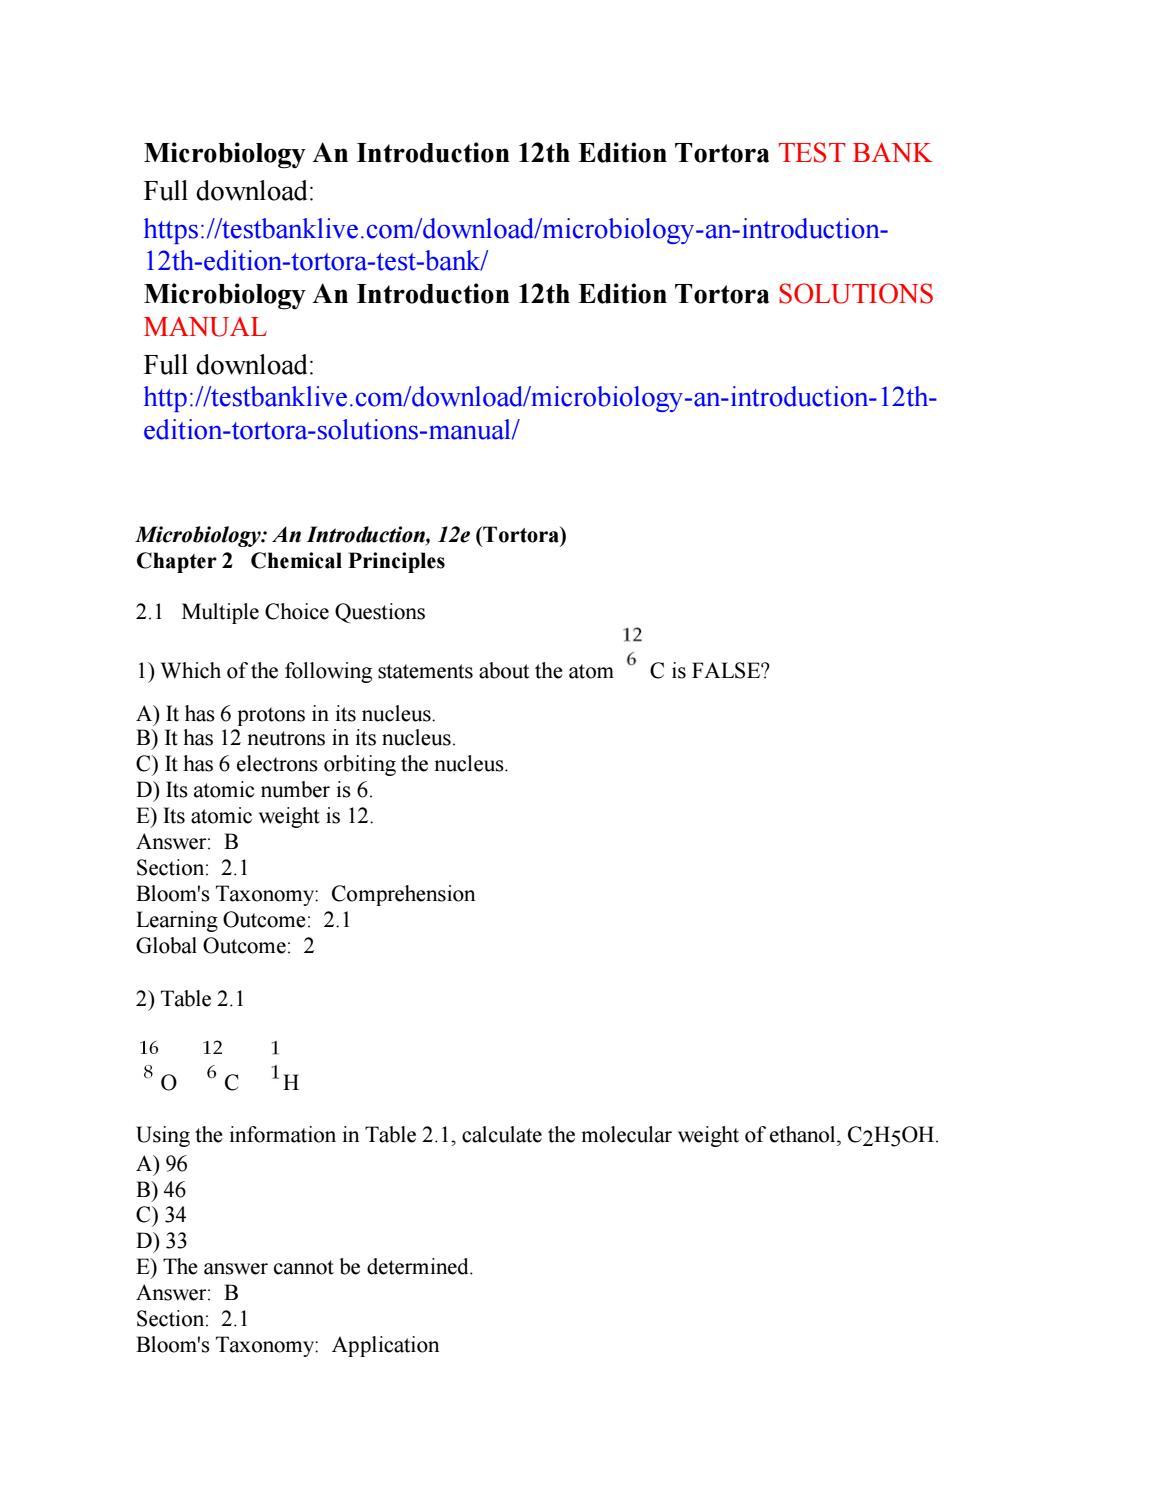 Microbiology an introduction 12th edition tortora test bank by Dugopolski -  issuu